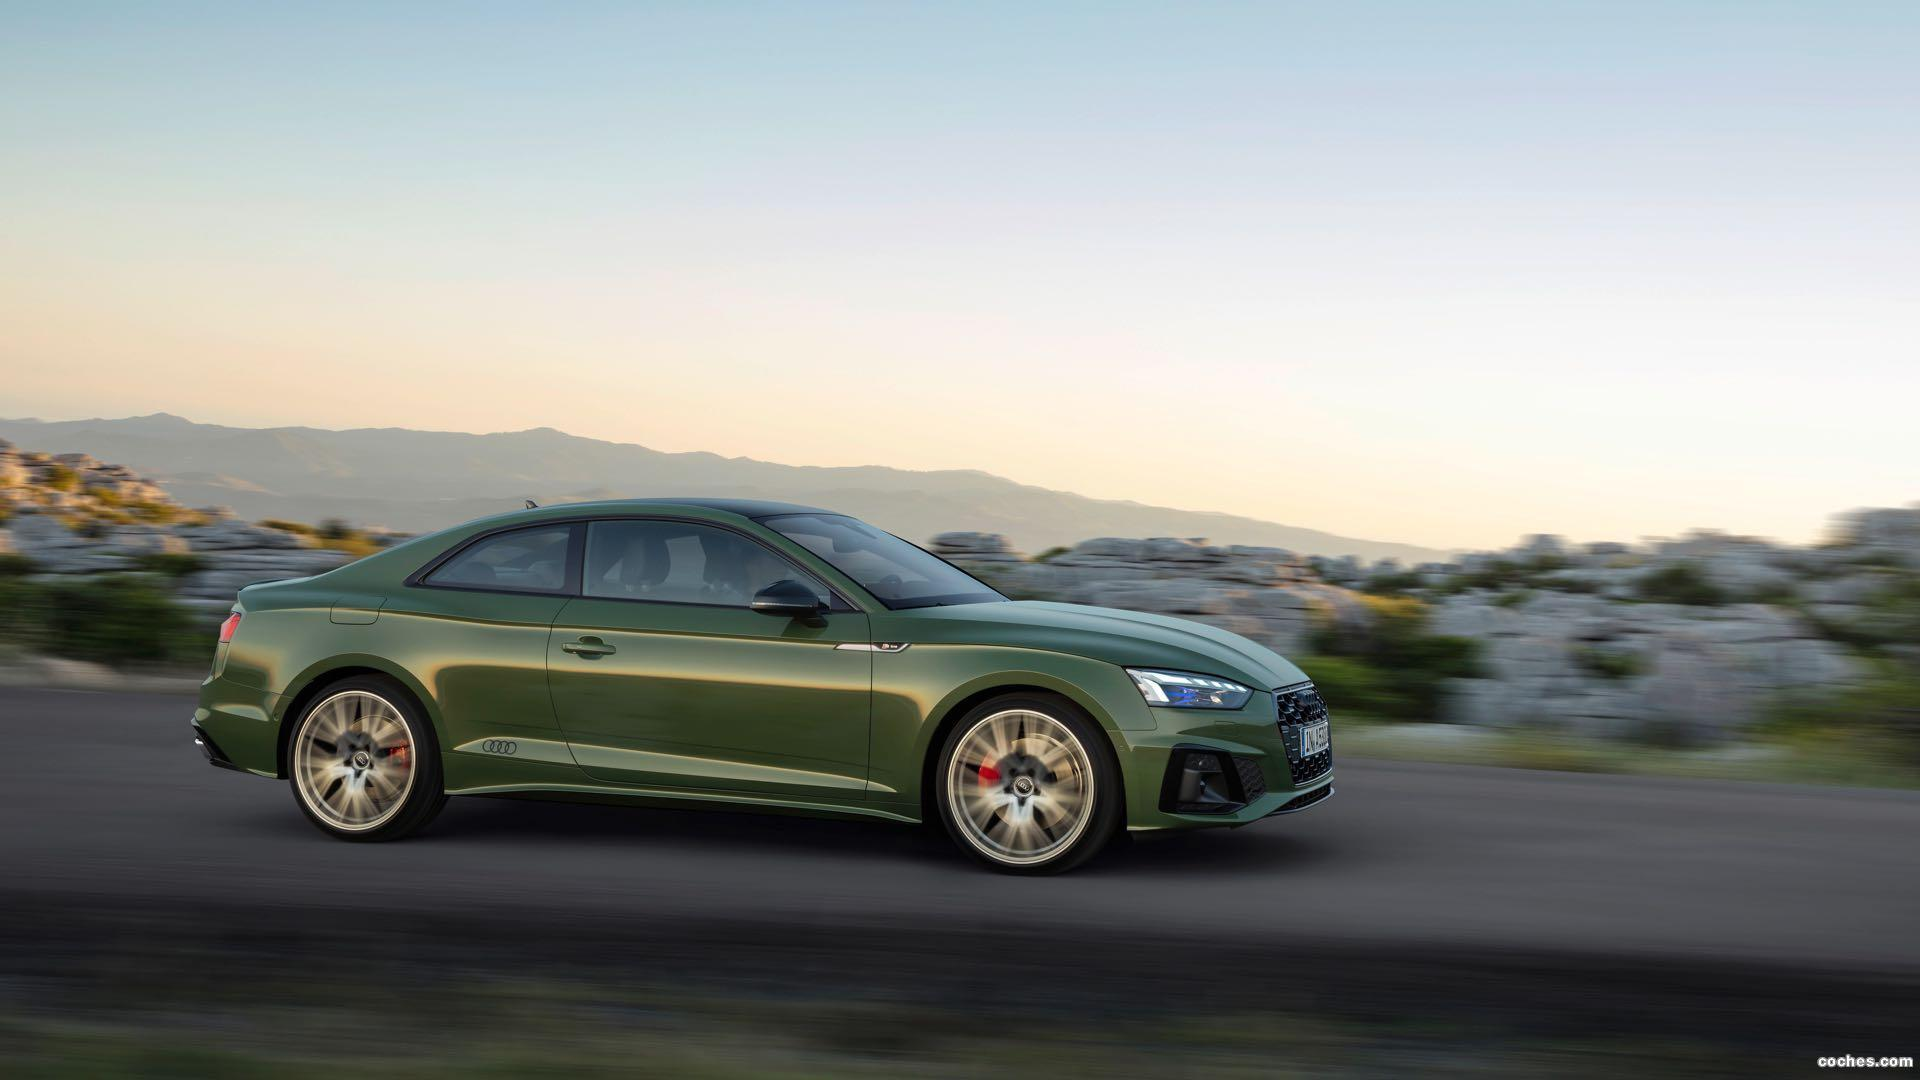 Foto 11 de Audi A5 40 TFSI quattro S line 2019